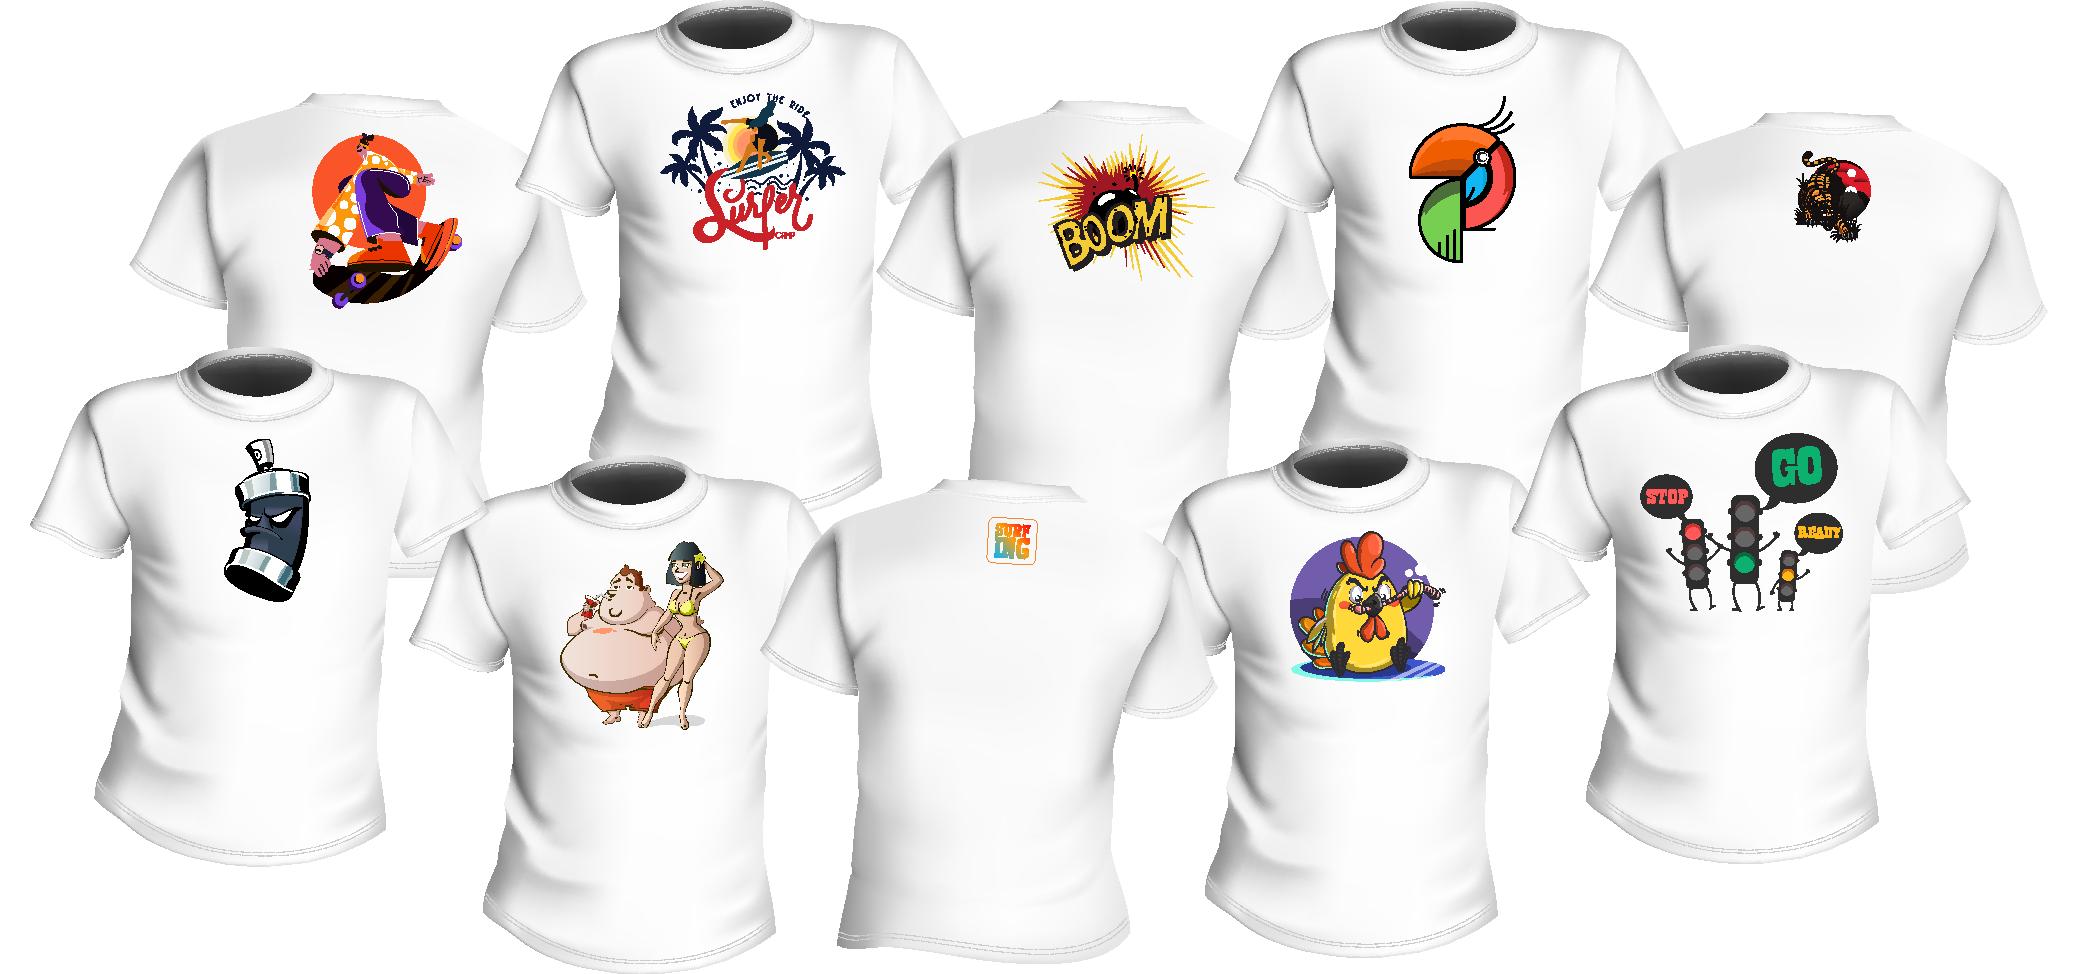 Immagine raffigurante 10 t-shirt in file sovrapposte di cinque. Cinque T-shirt sopra e cinque sotto.